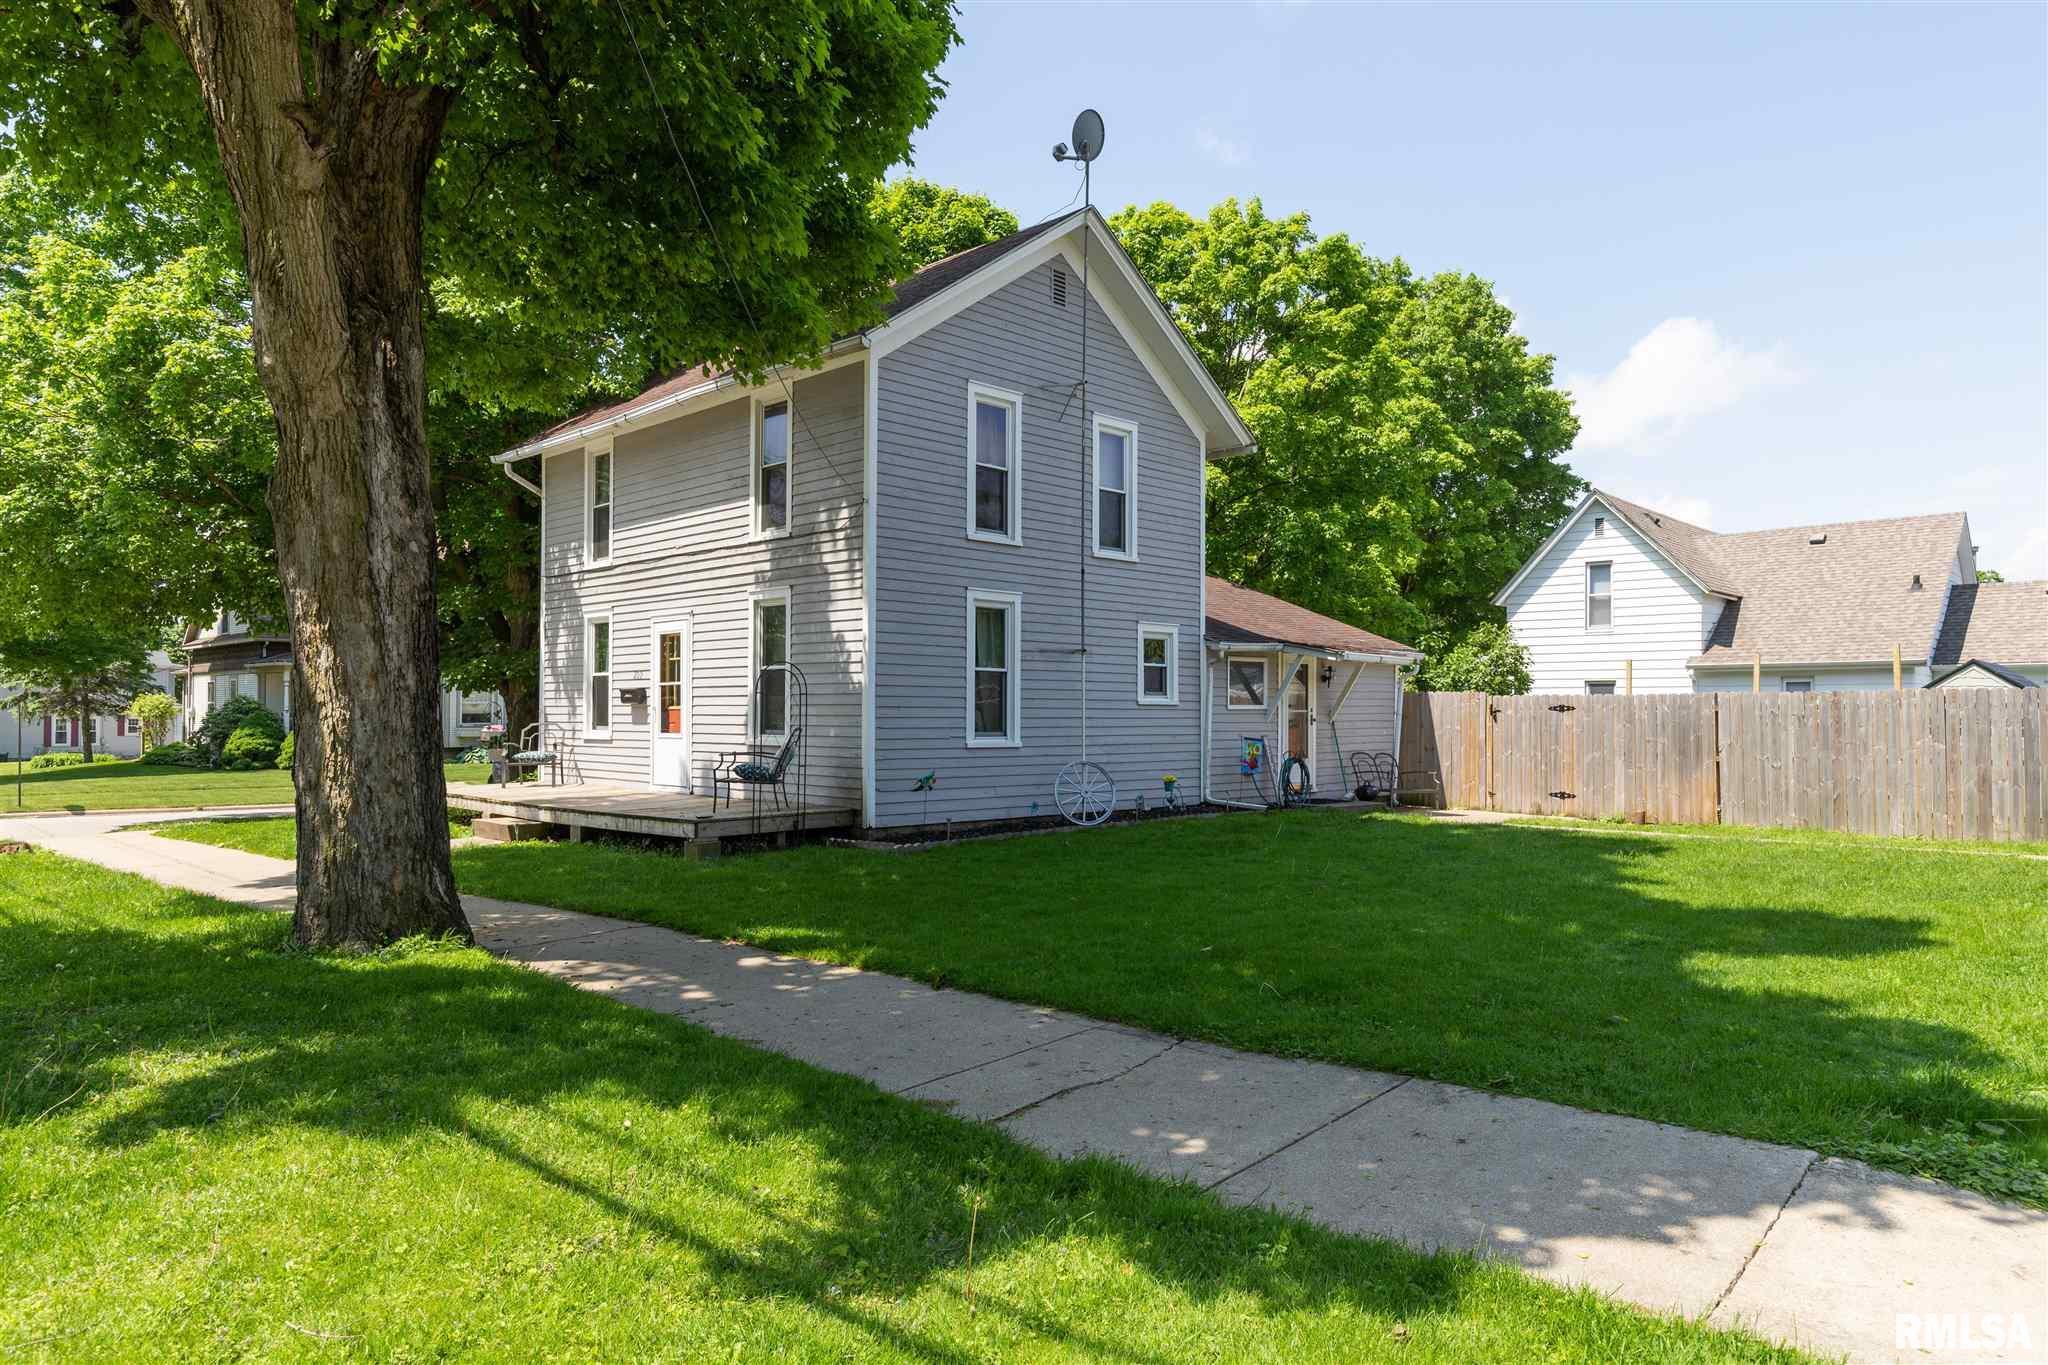 209 S ORANGE Property Photo - Morrison, IL real estate listing